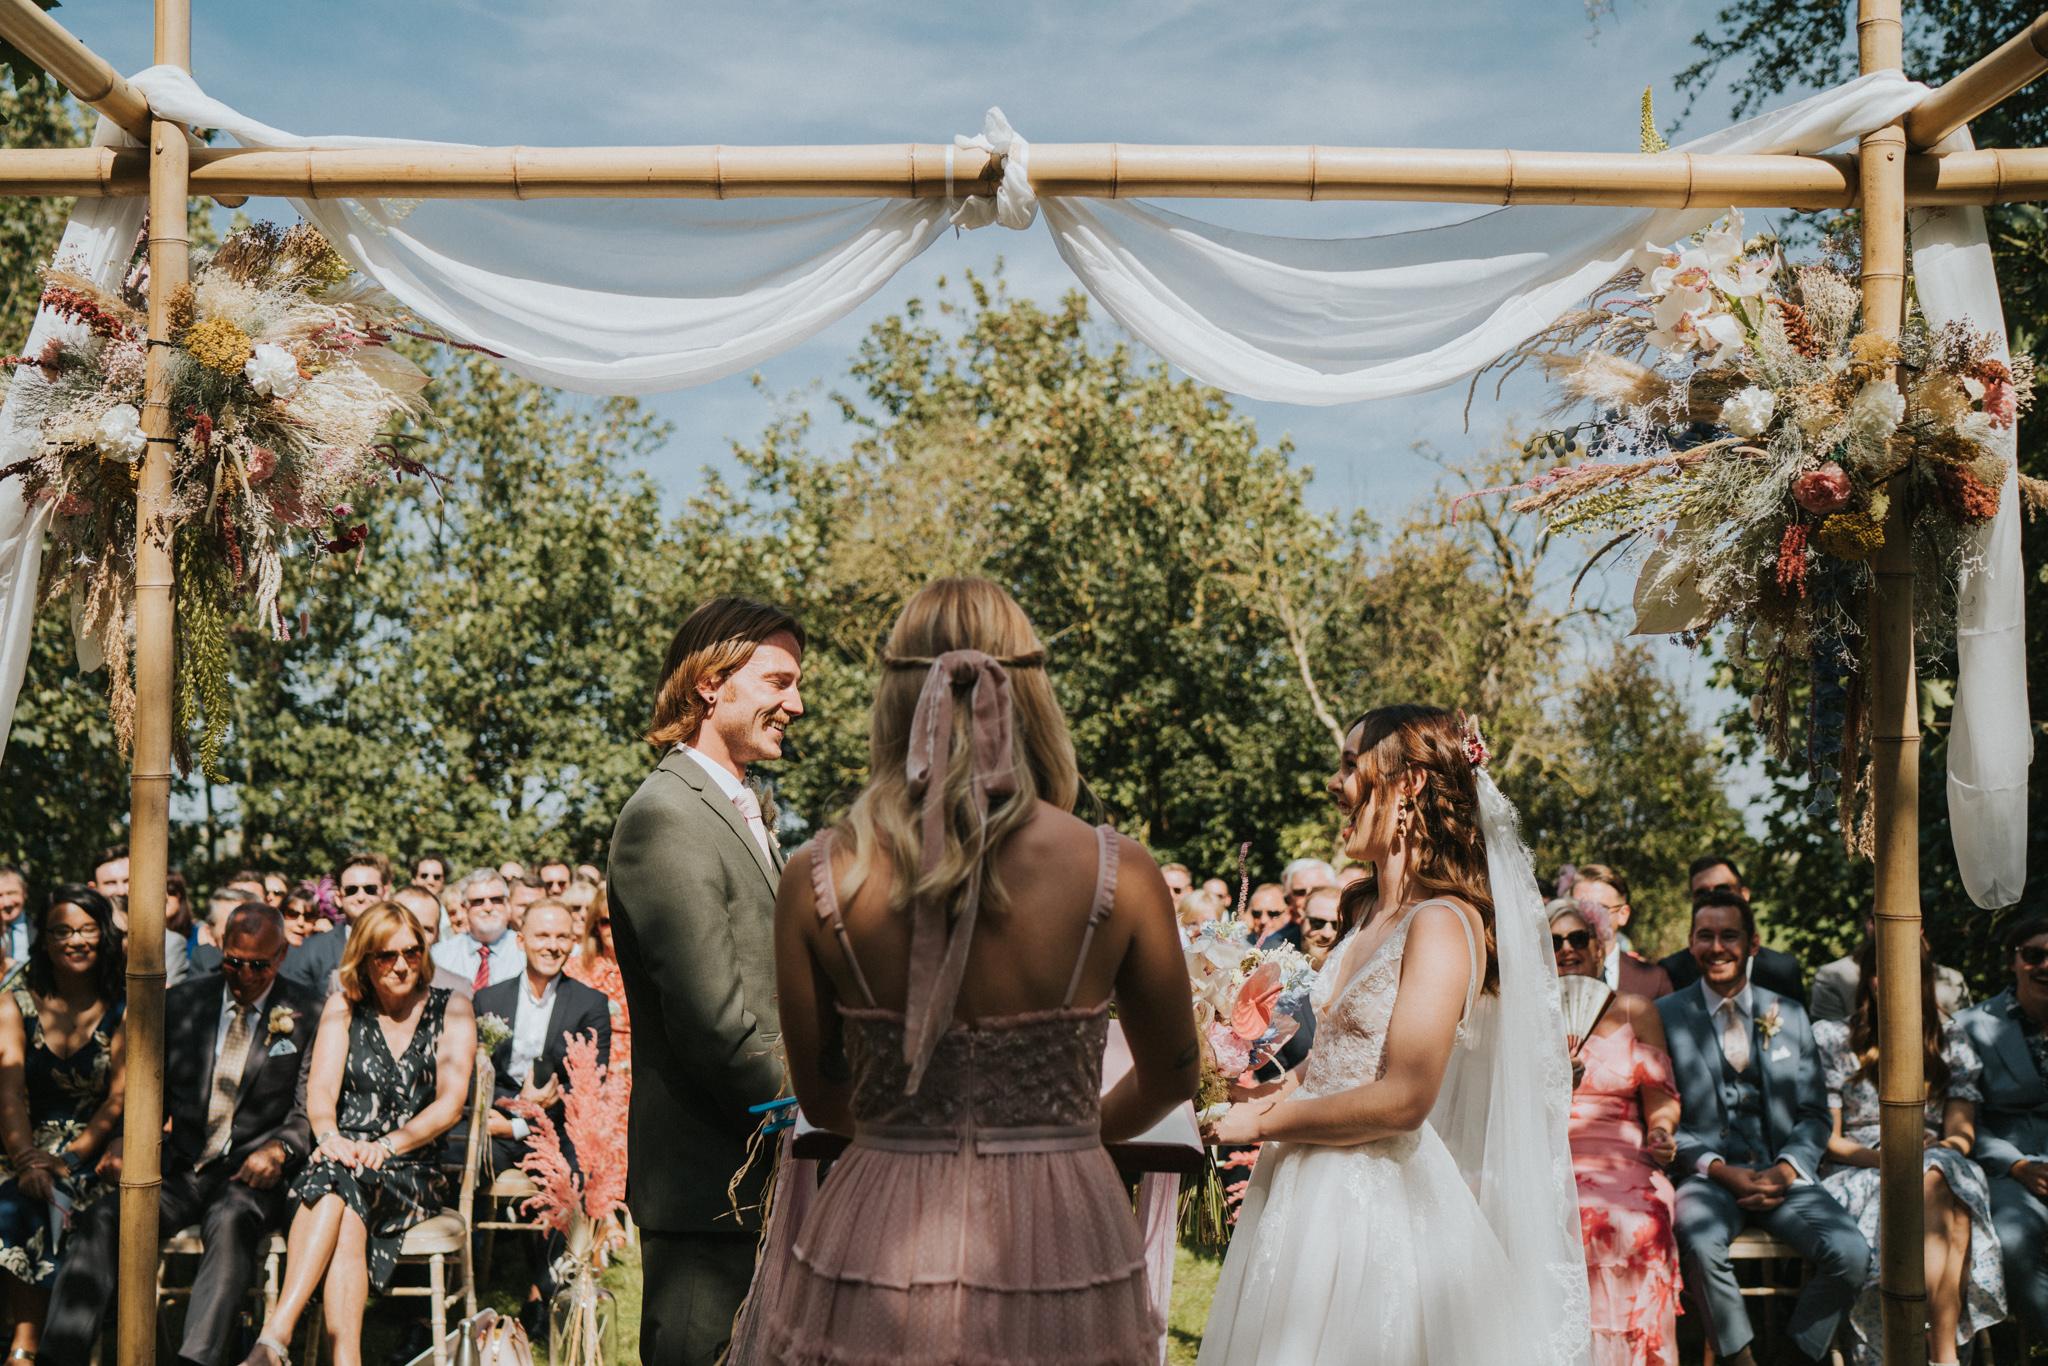 emi-Jack-boho-diy-wedding-eggington-house-grace-elizabeth-colchester-essex-alternative-wedding-photographer-suffolk-norfolk-devon (14 of 56).jpg